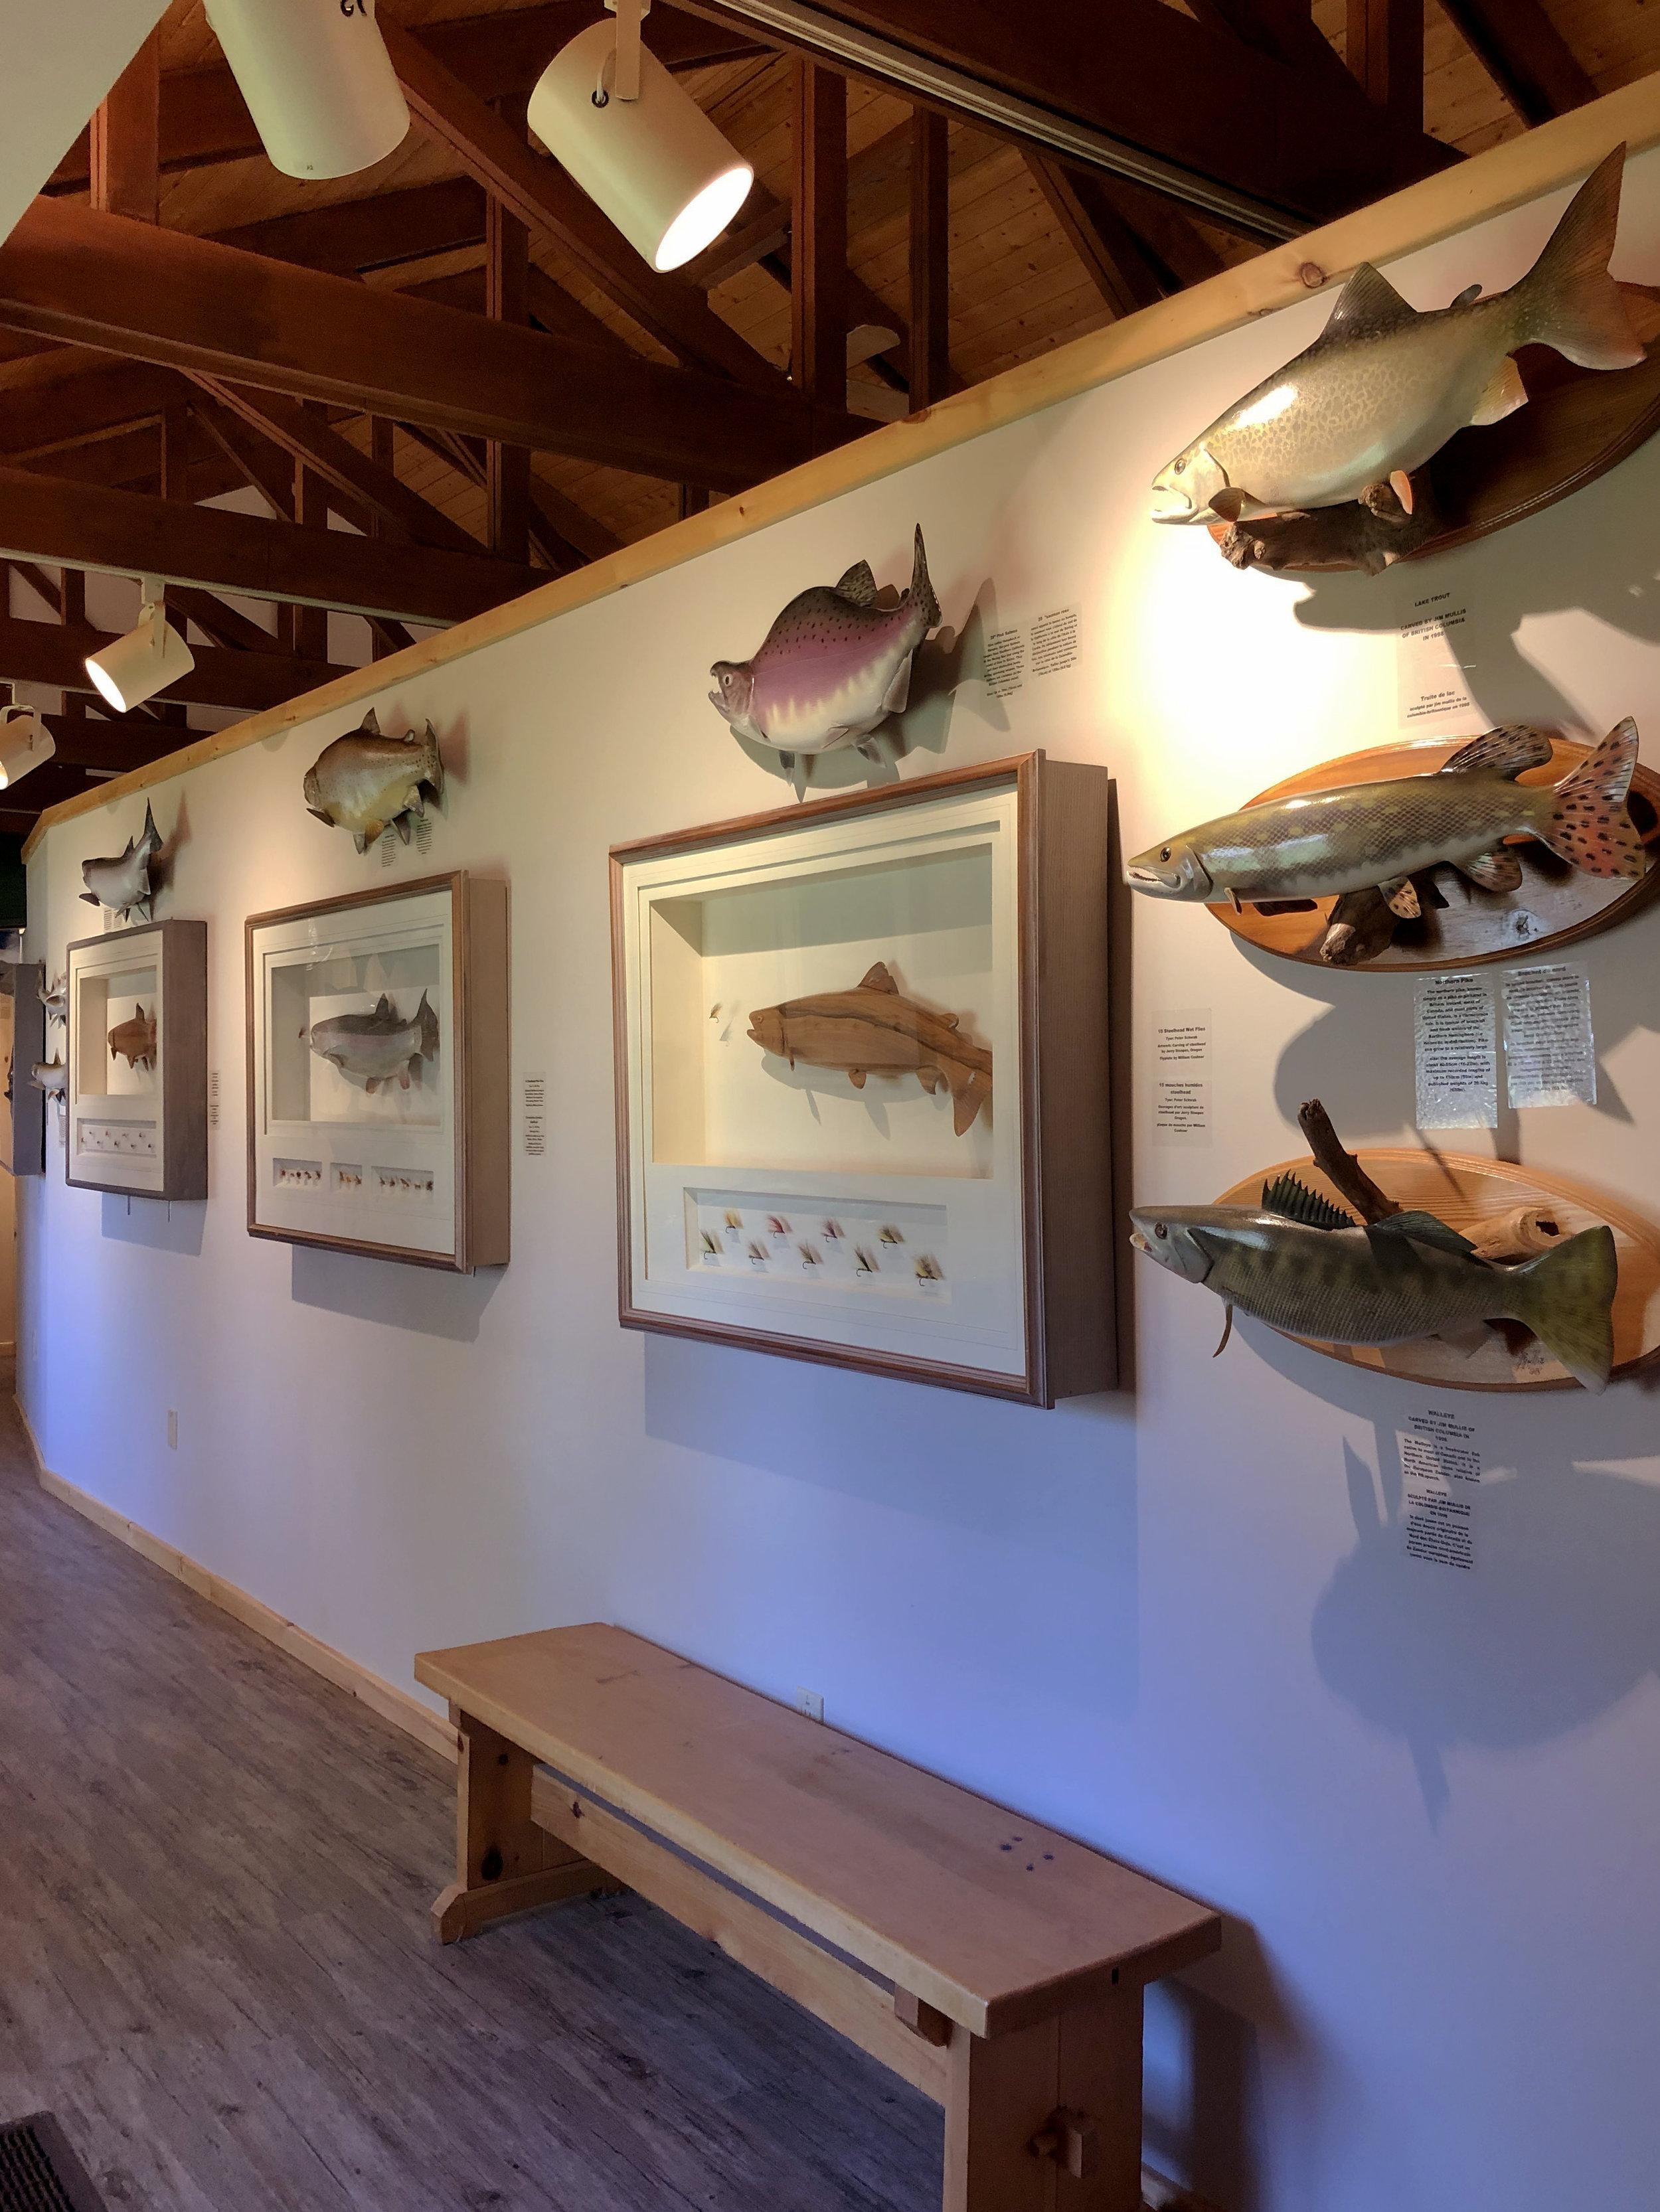 bench-artwork-fish-models.jpg